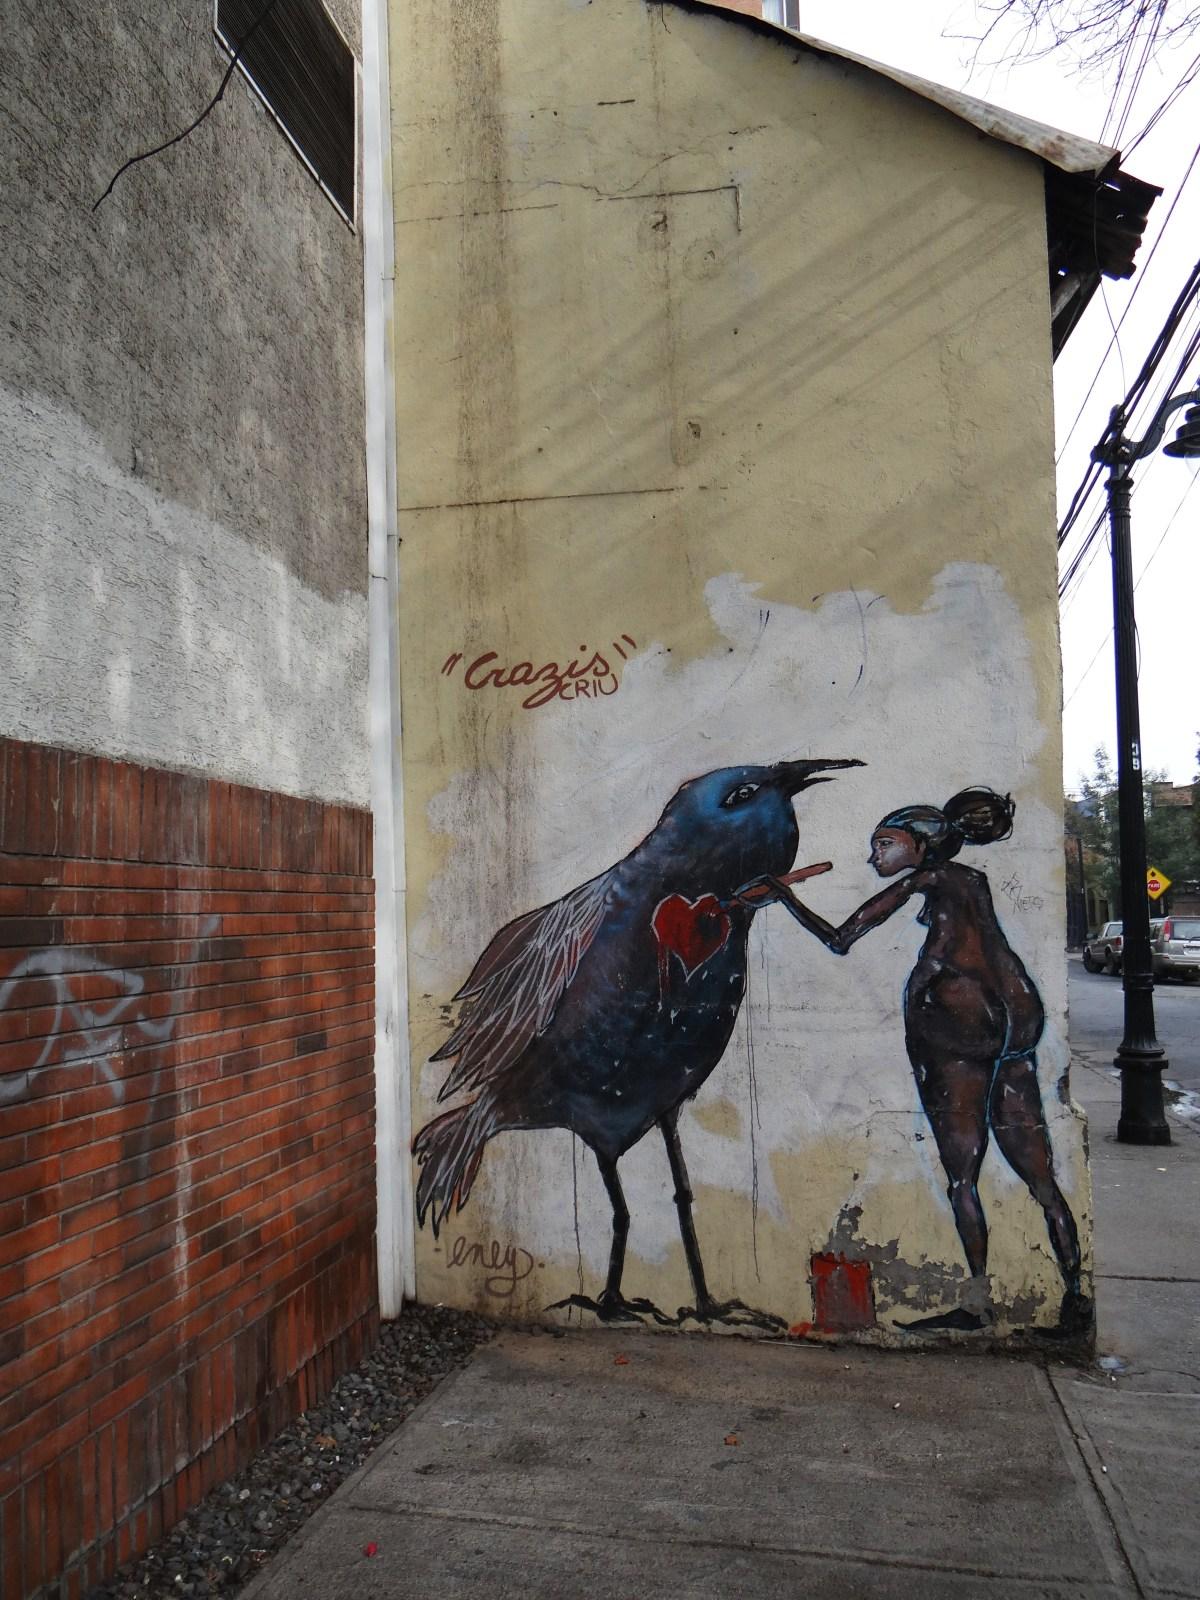 Goodbye graffiti filledSantiago!